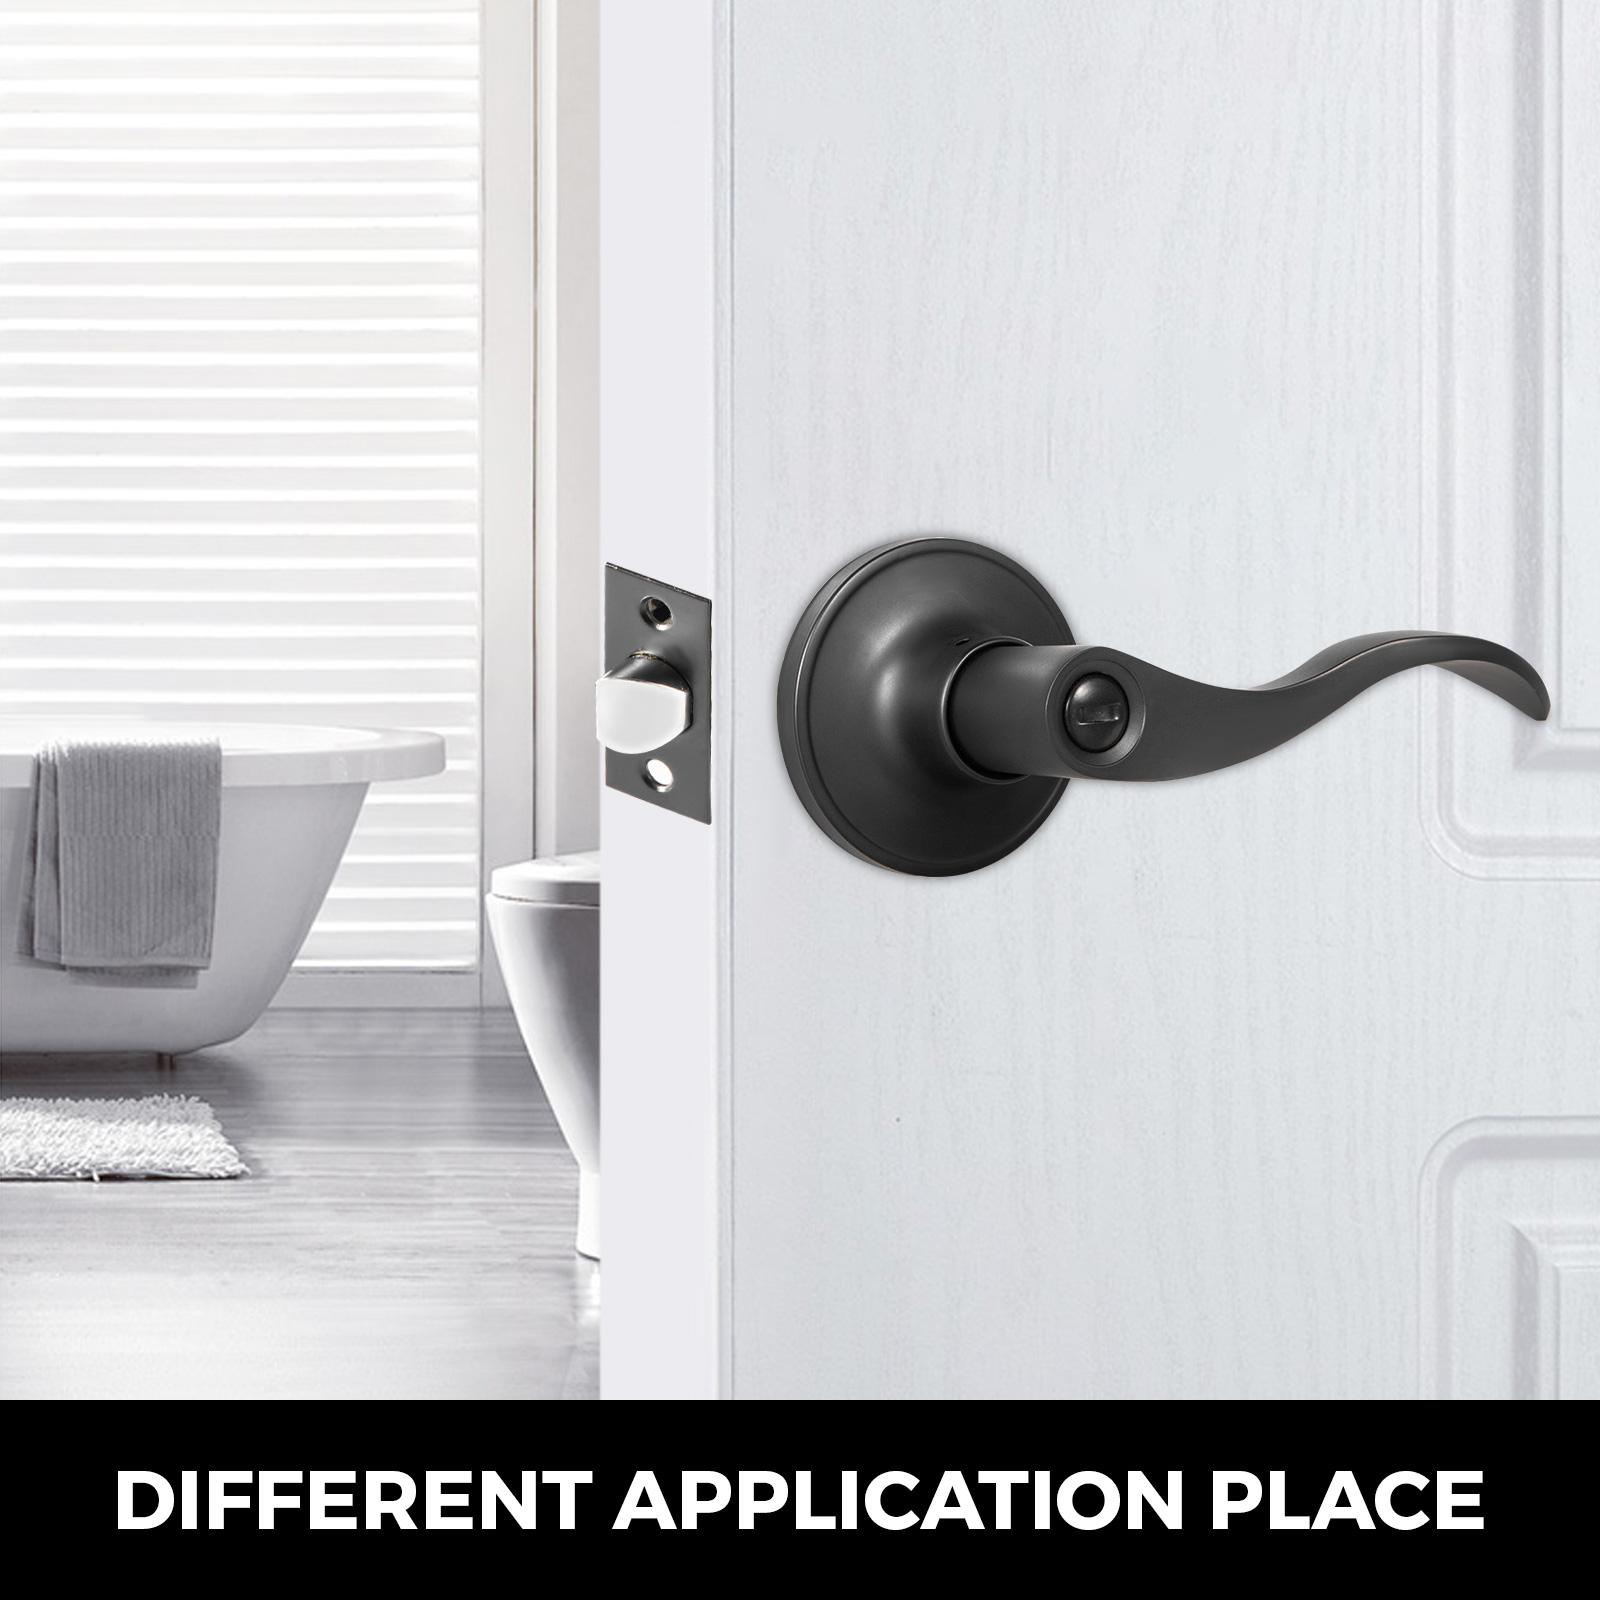 Door-Handles-Matte-Black-Door-Lever-3-5-10-Pack-Passage-Privace-Entry-Lock-Set thumbnail 103